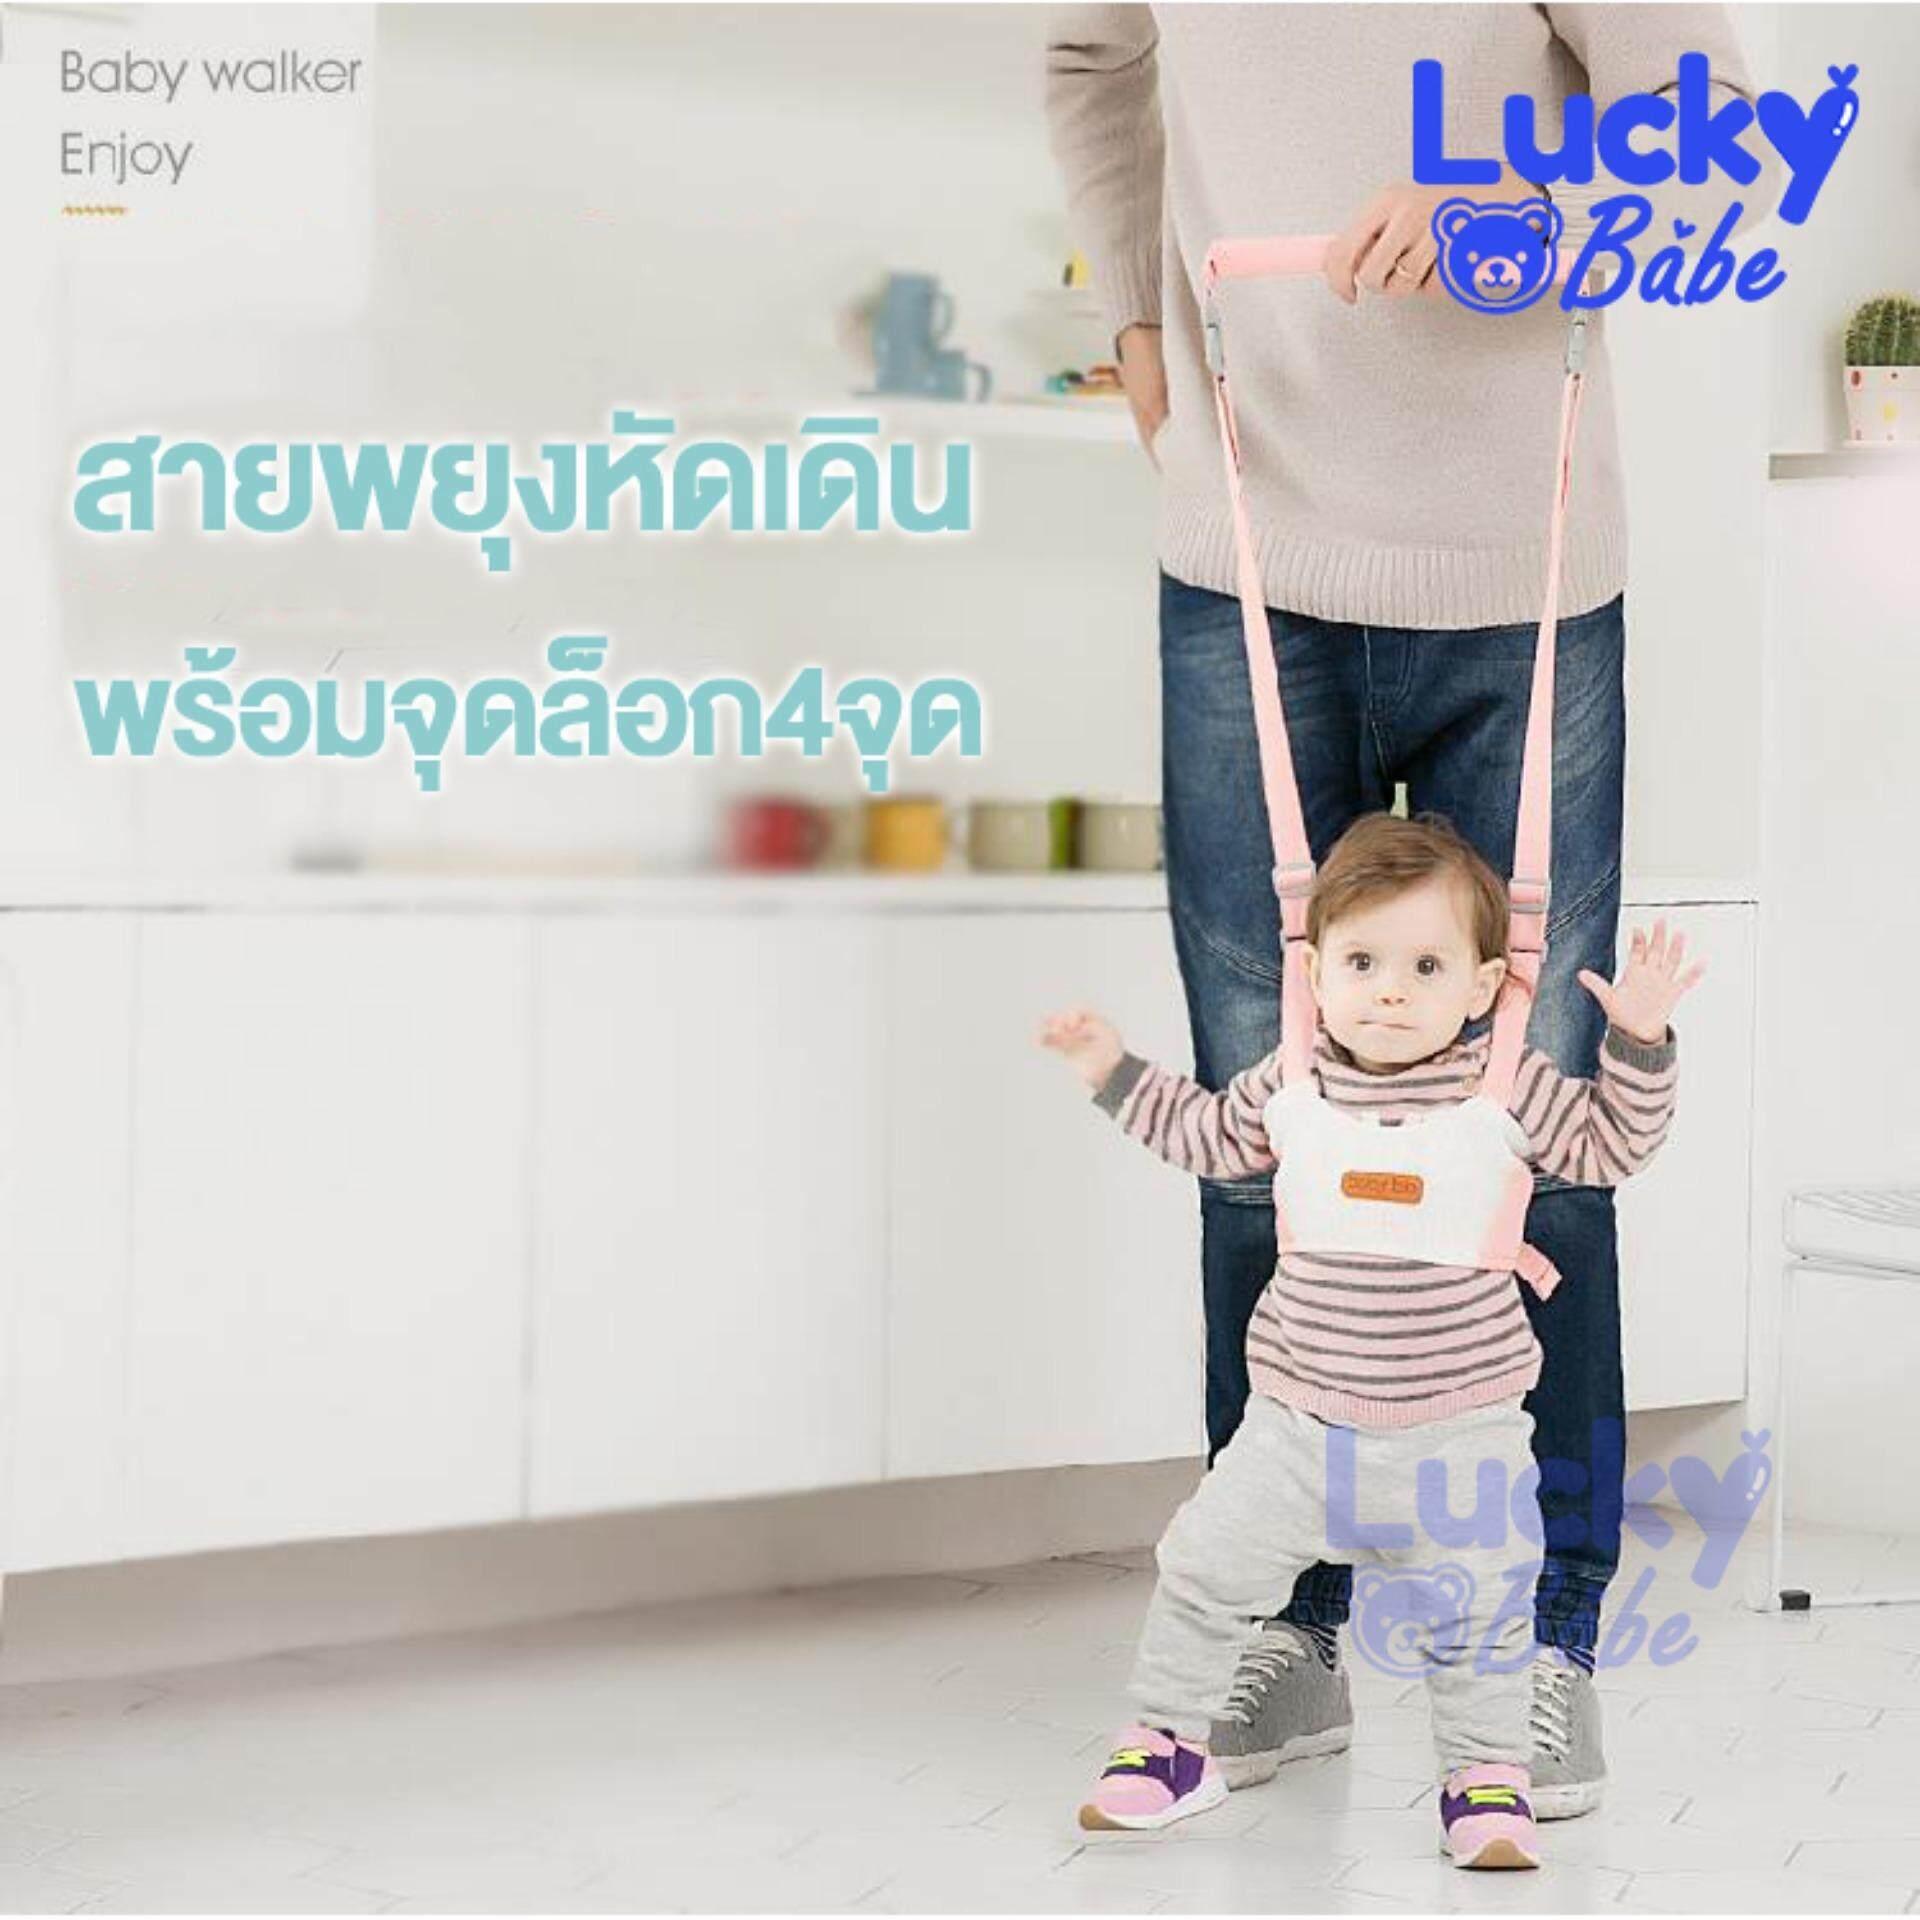 Lucky Team Baby Walker อุปกรณ์พยุงเด็กวัยหัดเดิน สายพยุงหัดเดินสำหรับเด็ก BA09  ราคา